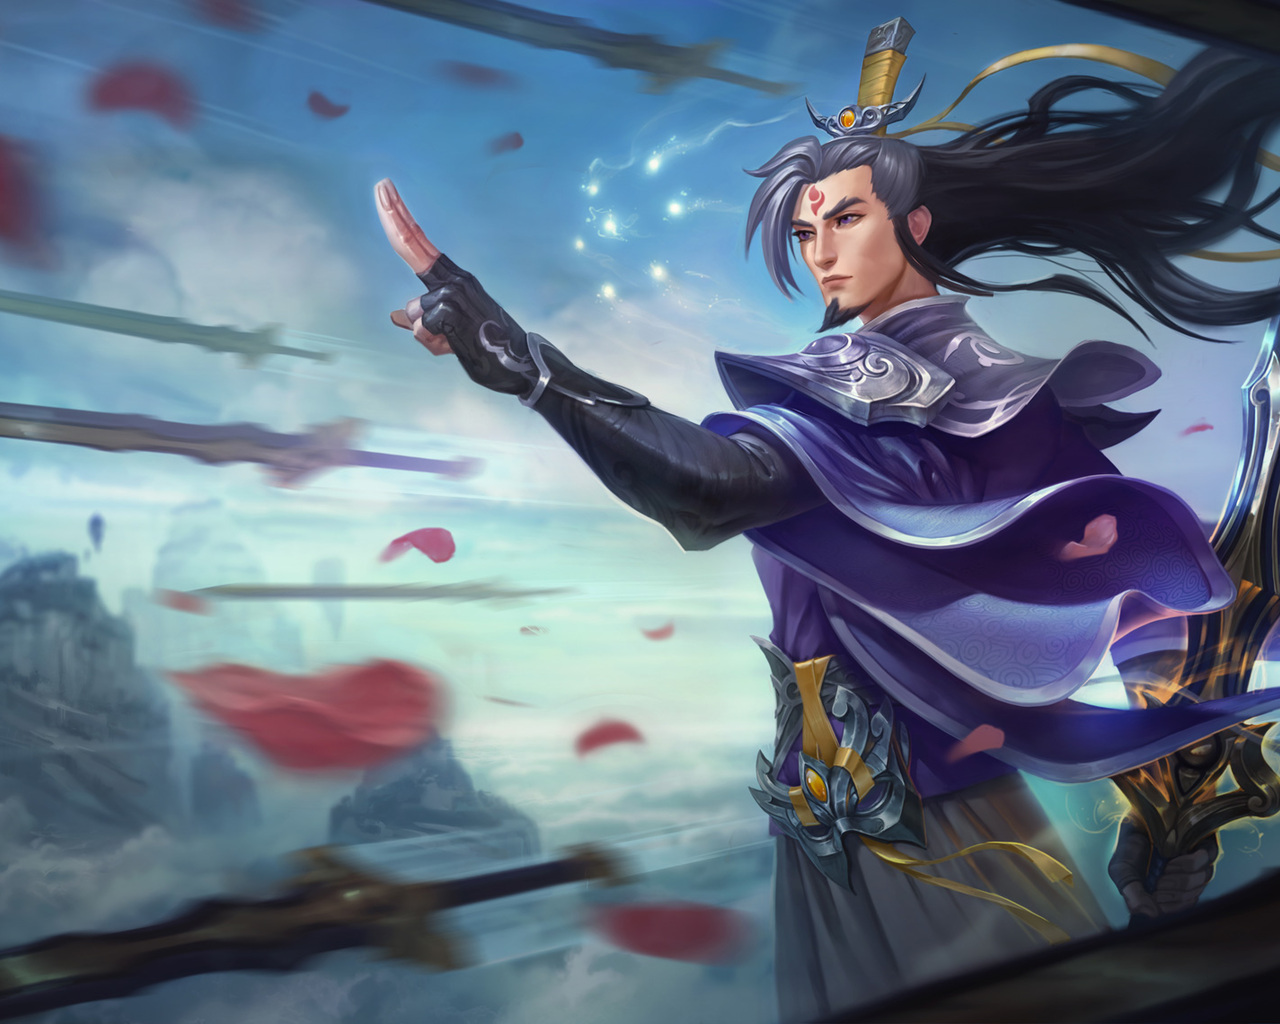 1280x1024 Master Yi League Of Legends 1280x1024 Resolution Hd 4k